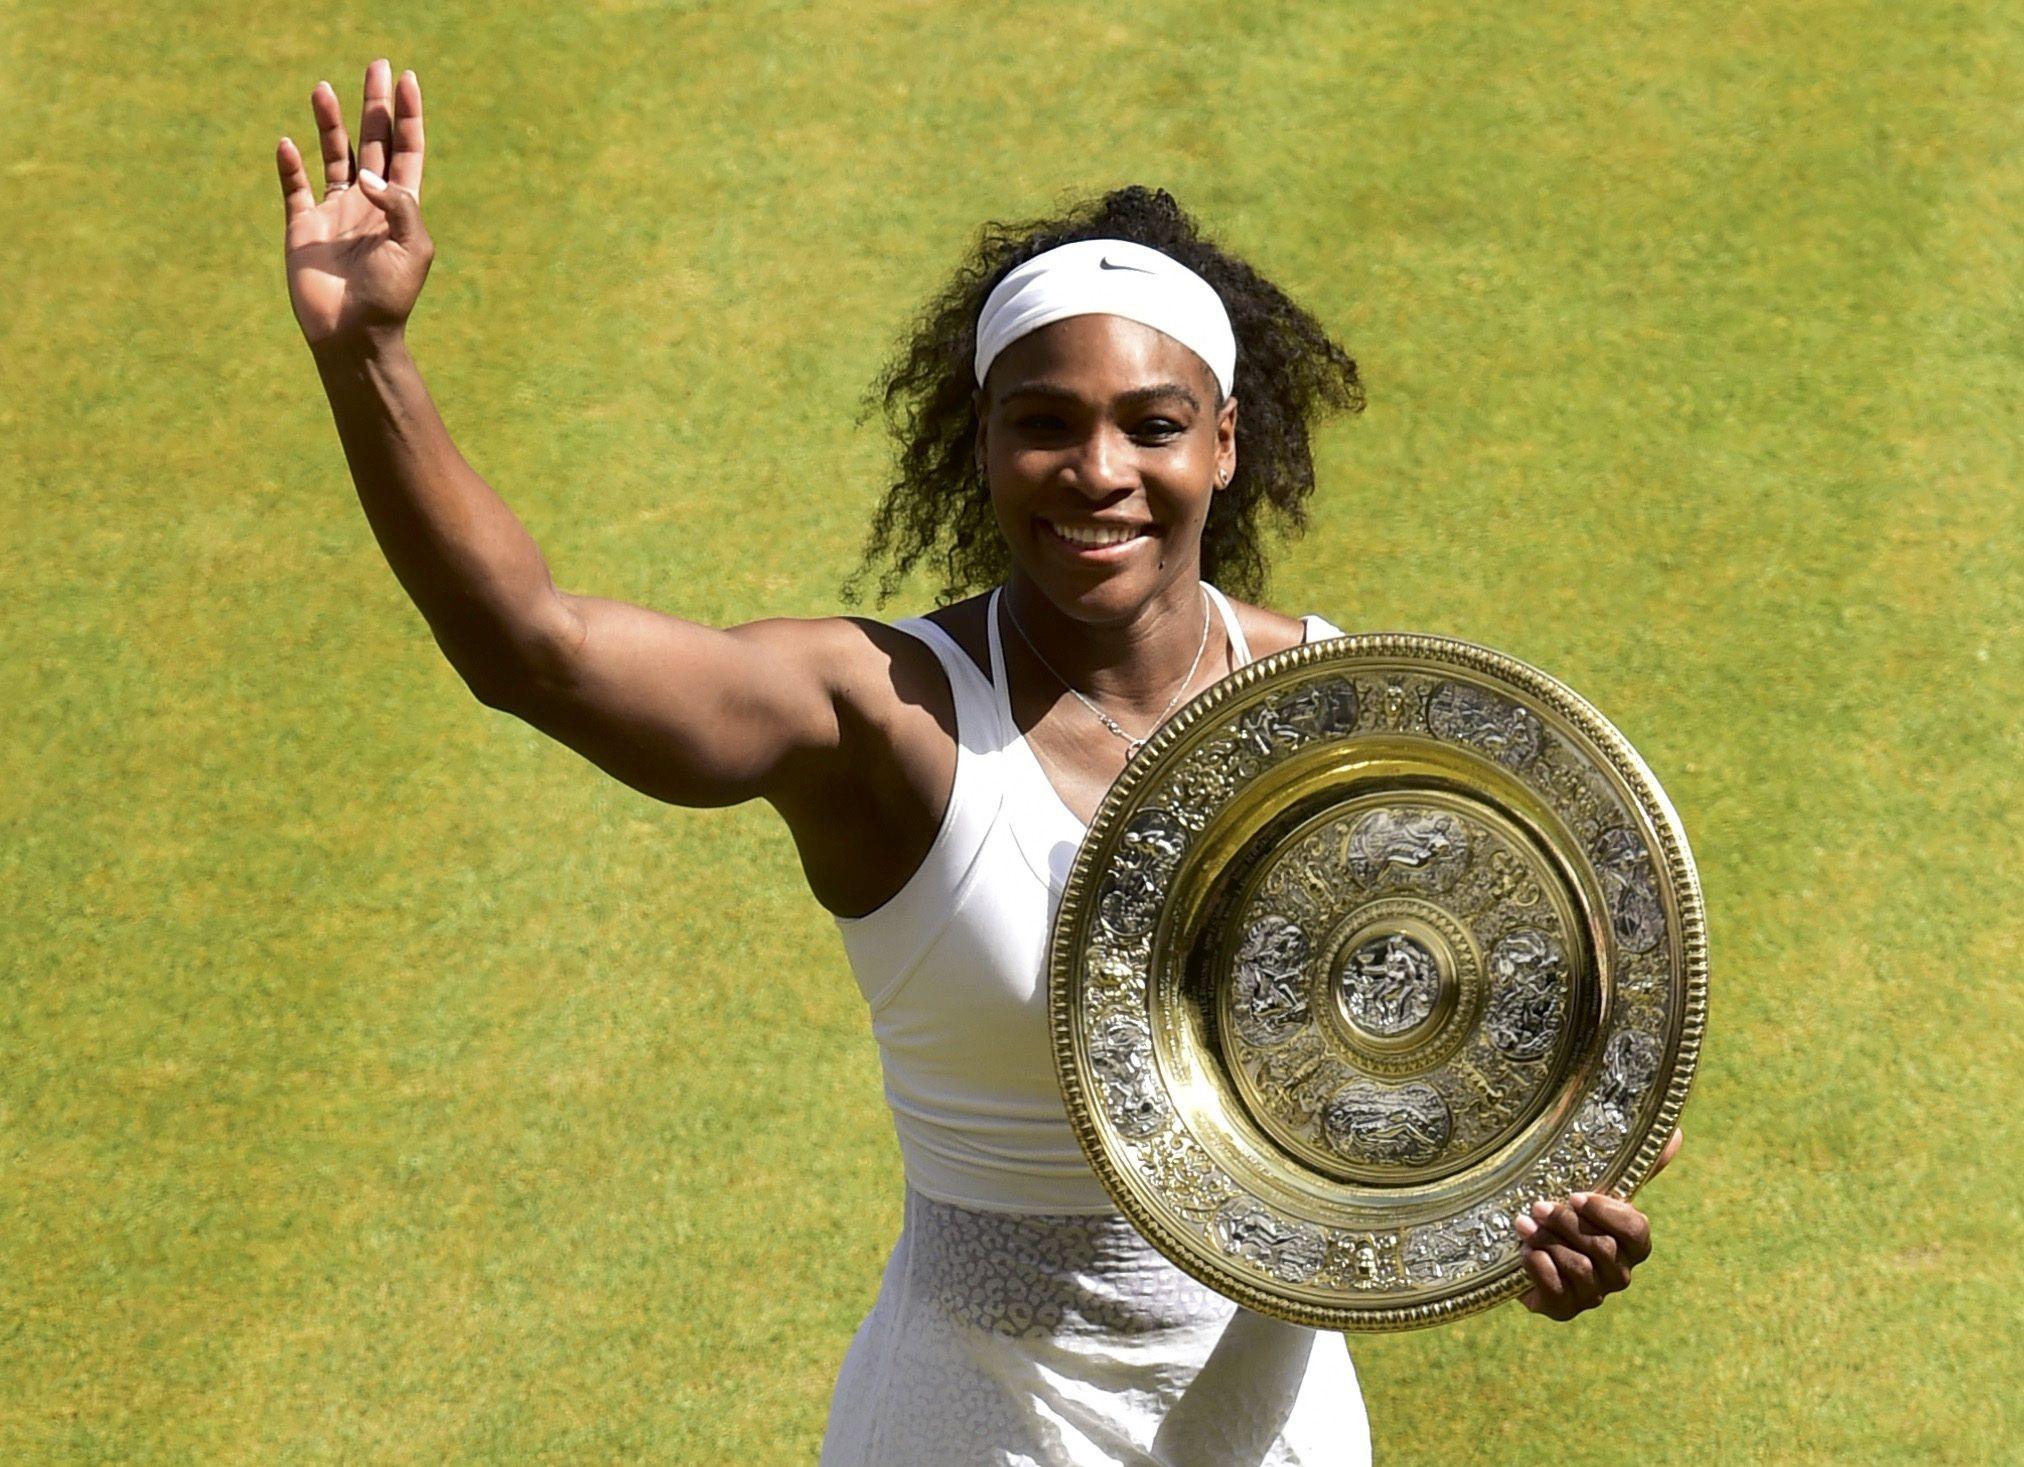 Serena festeja su sexto título en Wimbledon.  (Foto: Reuters)